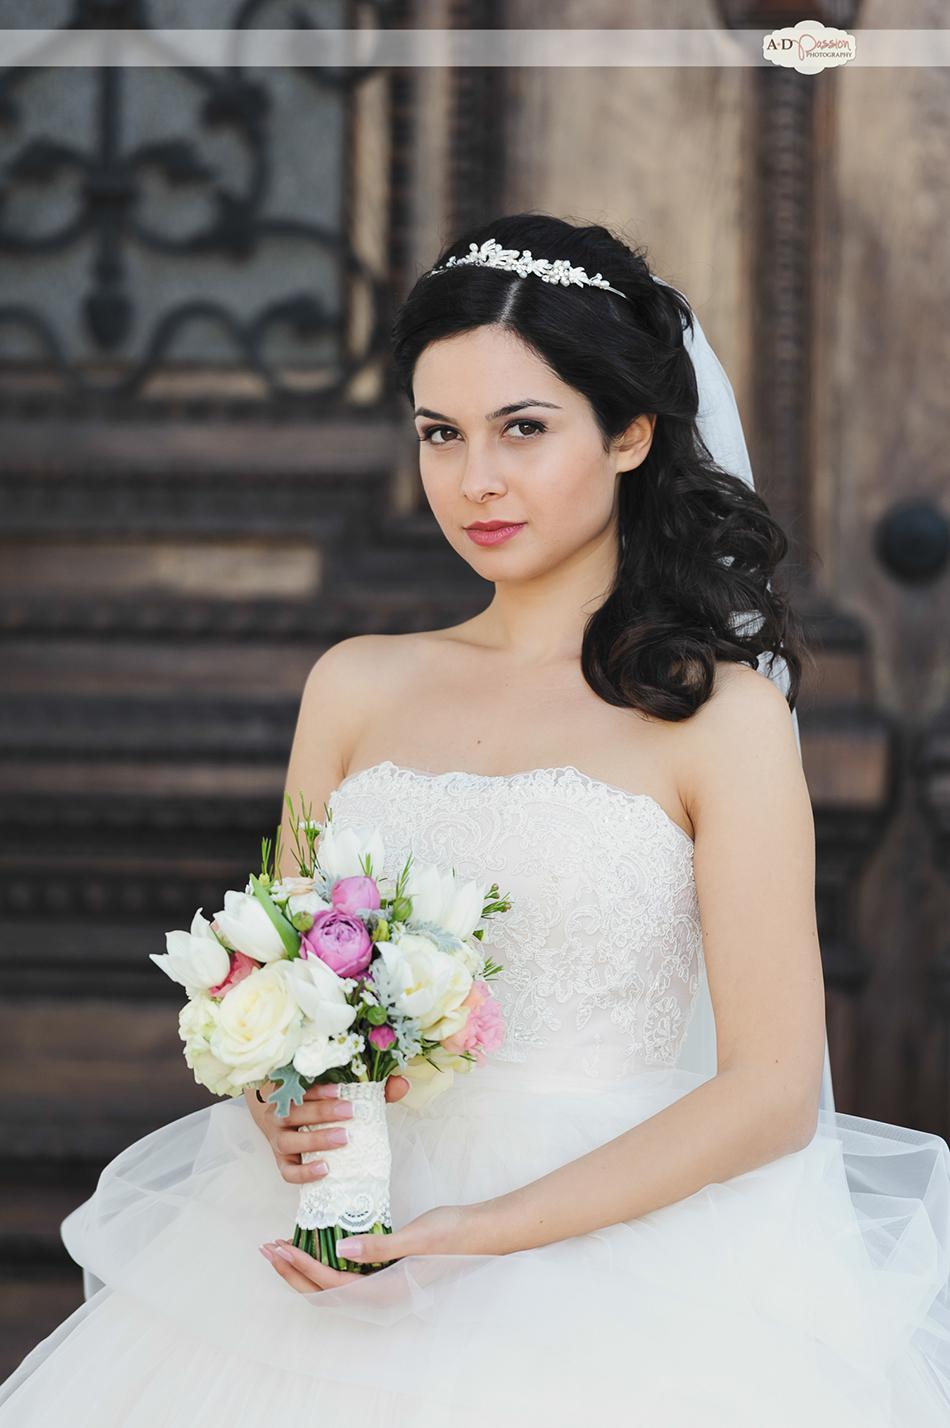 AD Passion Photography | fotograf-profesionist-de-nunta-arad-timisoara-bucuresti_madalina+mihnea_0098 | Adelin, Dida, fotograf profesionist, fotograf de nunta, fotografie de nunta, fotograf Timisoara, fotograf Craiova, fotograf Bucuresti, fotograf Arad, nunta Timisoara, nunta Arad, nunta Bucuresti, nunta Craiova